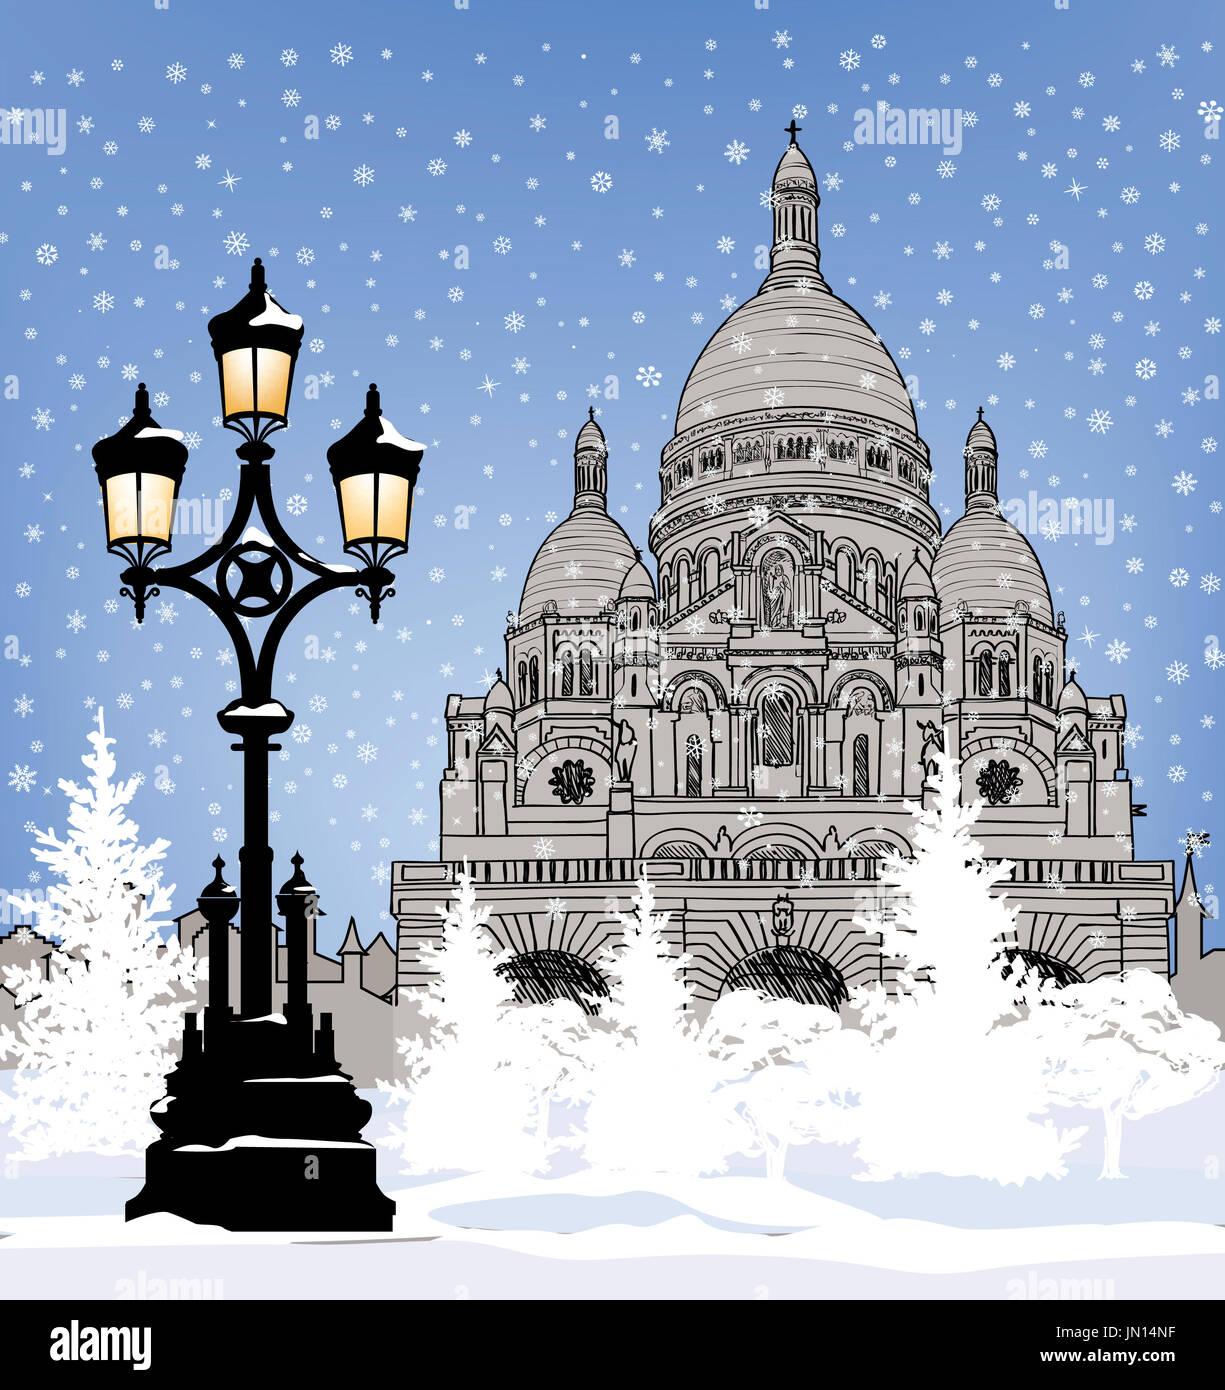 Snowy City Wallpaper Winter Holiday Snow Background Paris